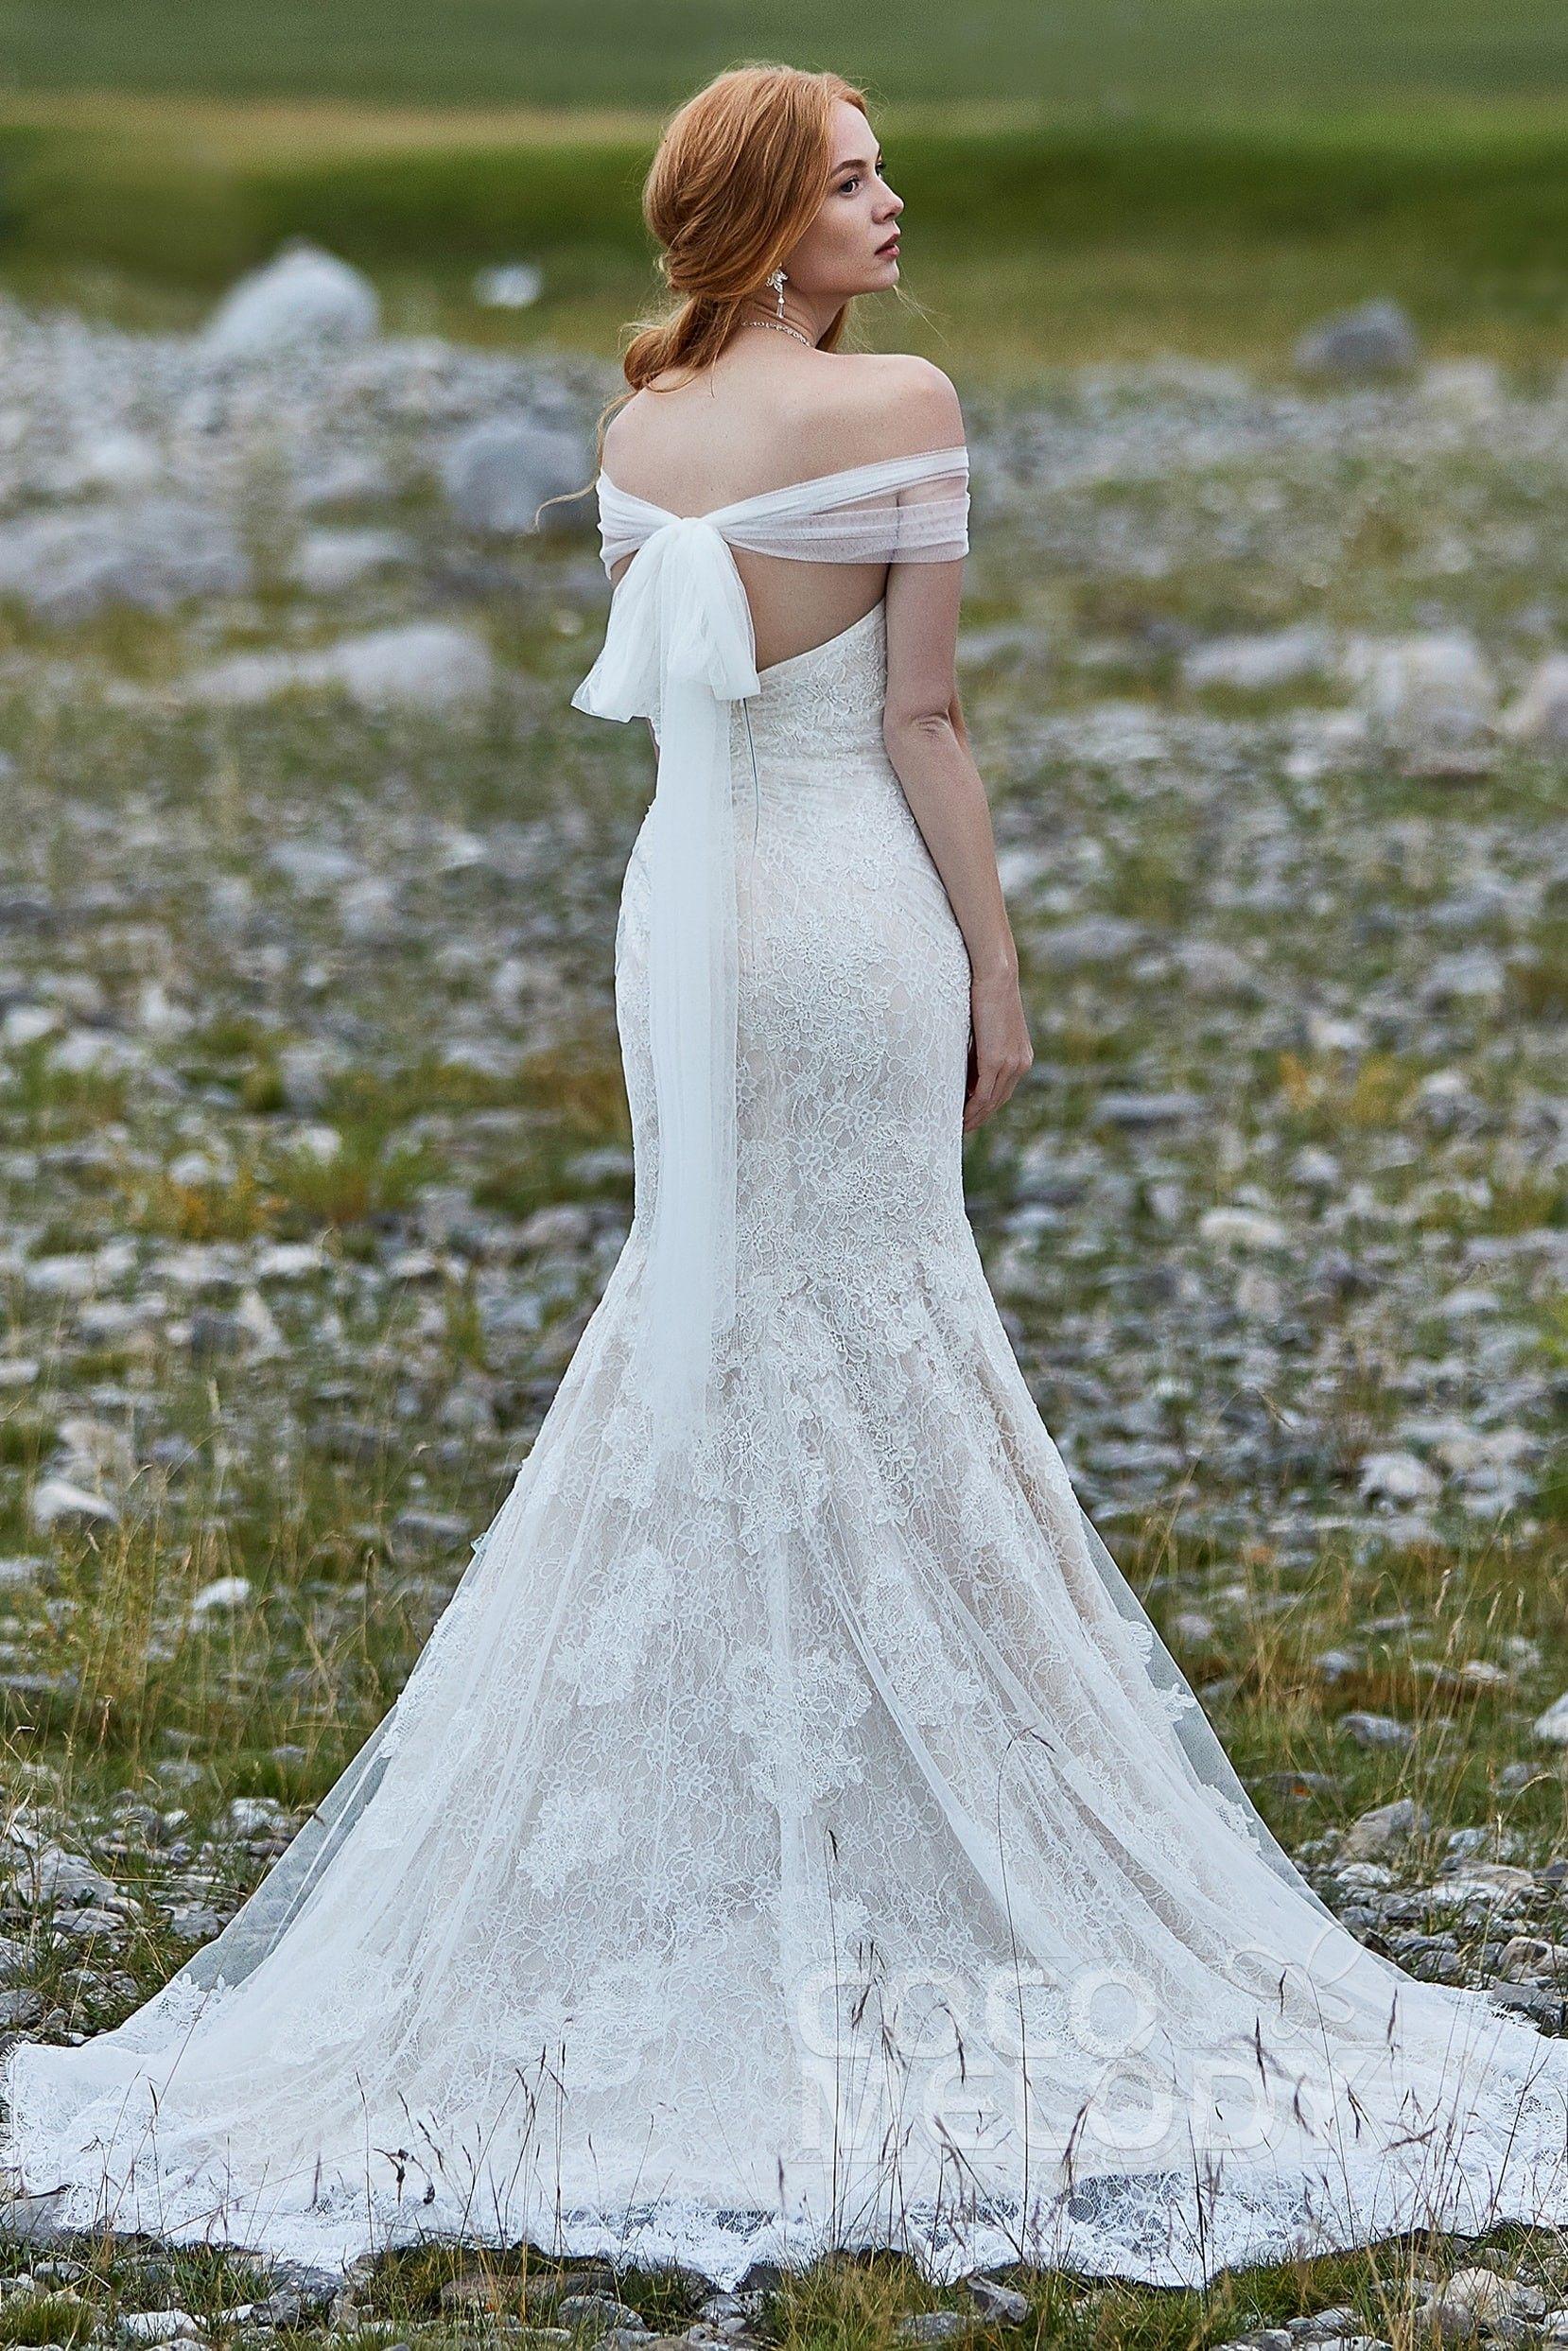 8eeb6c31a1847 Sweetheart Natural Lace Zipper Wedding Dress #LD5778 | Cocomelody # cocomelody #weddingdress #bridalgown #mermaidweddingdress